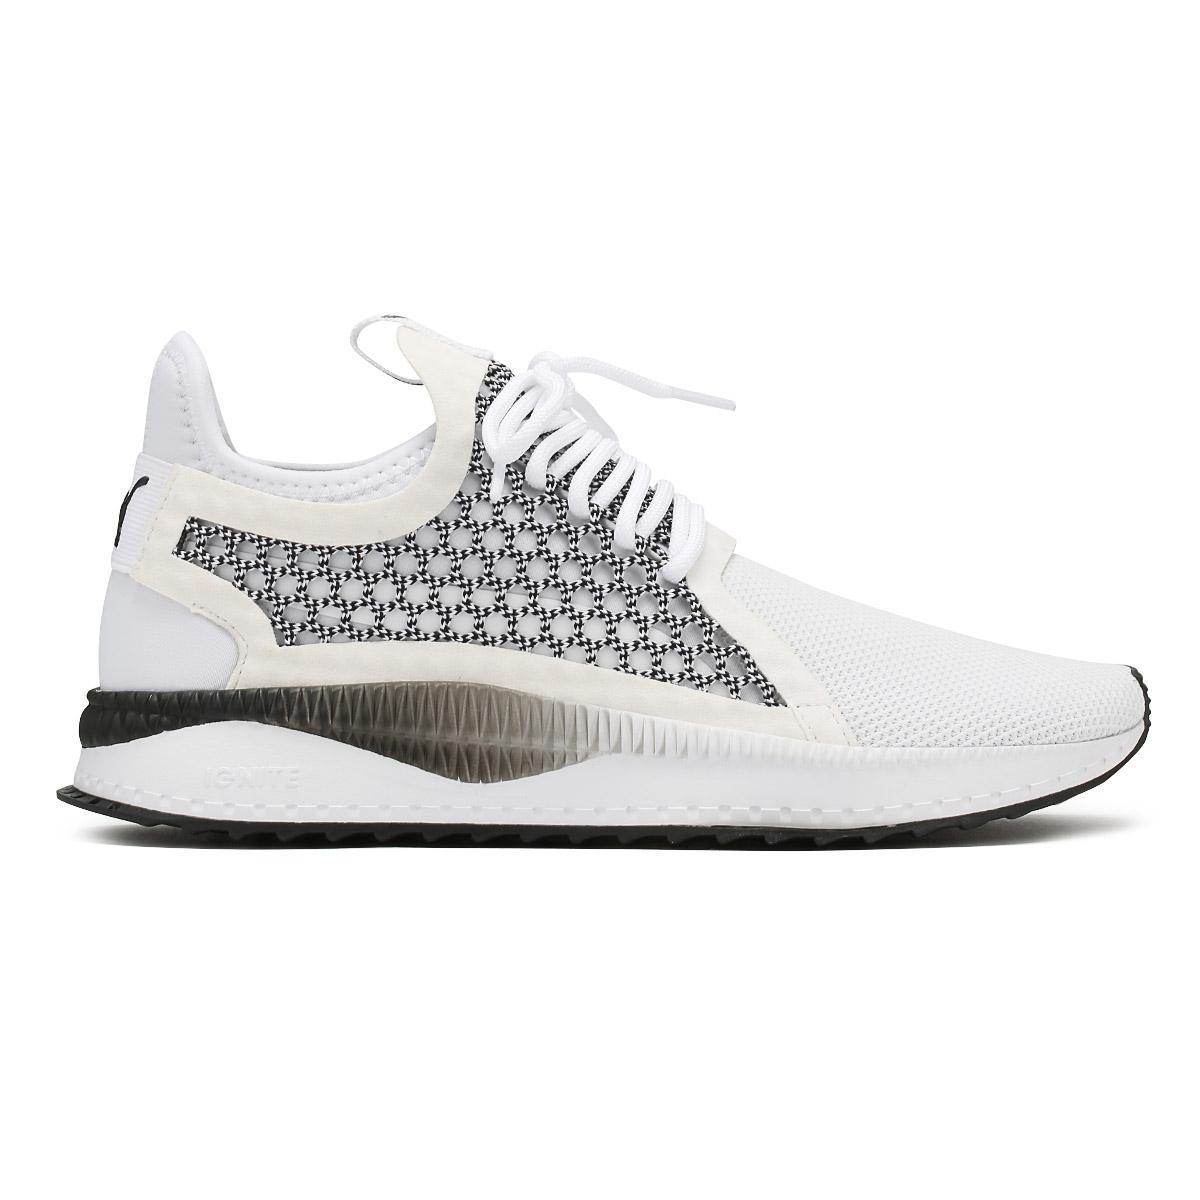 0bbb6b53e38d PUMA Mens Trainers White   Black Tsugi Netfit v2 Lace Up Sport Running Shoes